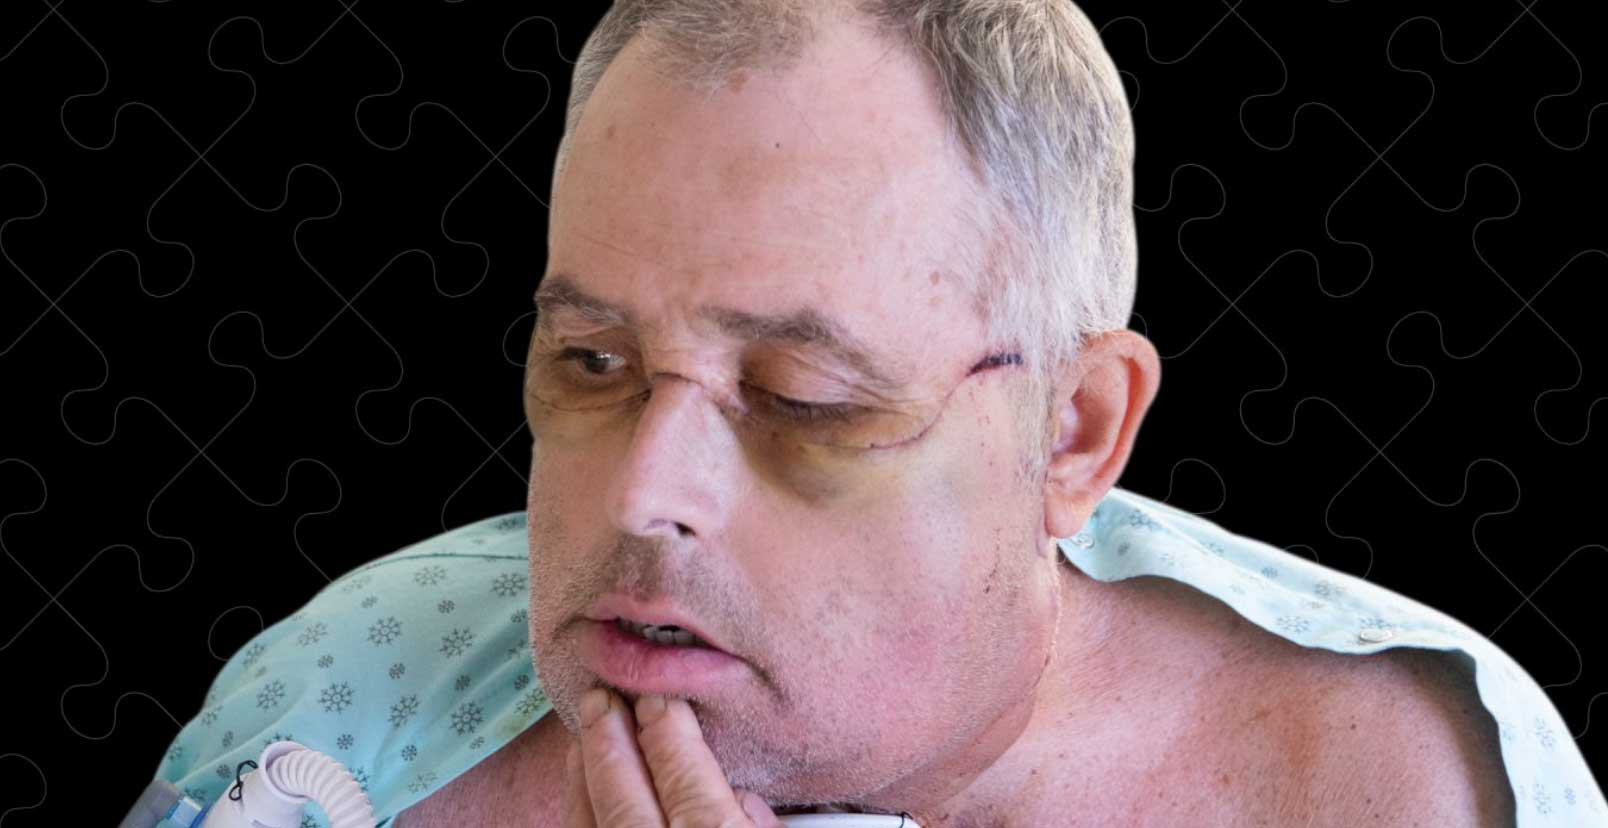 canadafirstfacetransplant